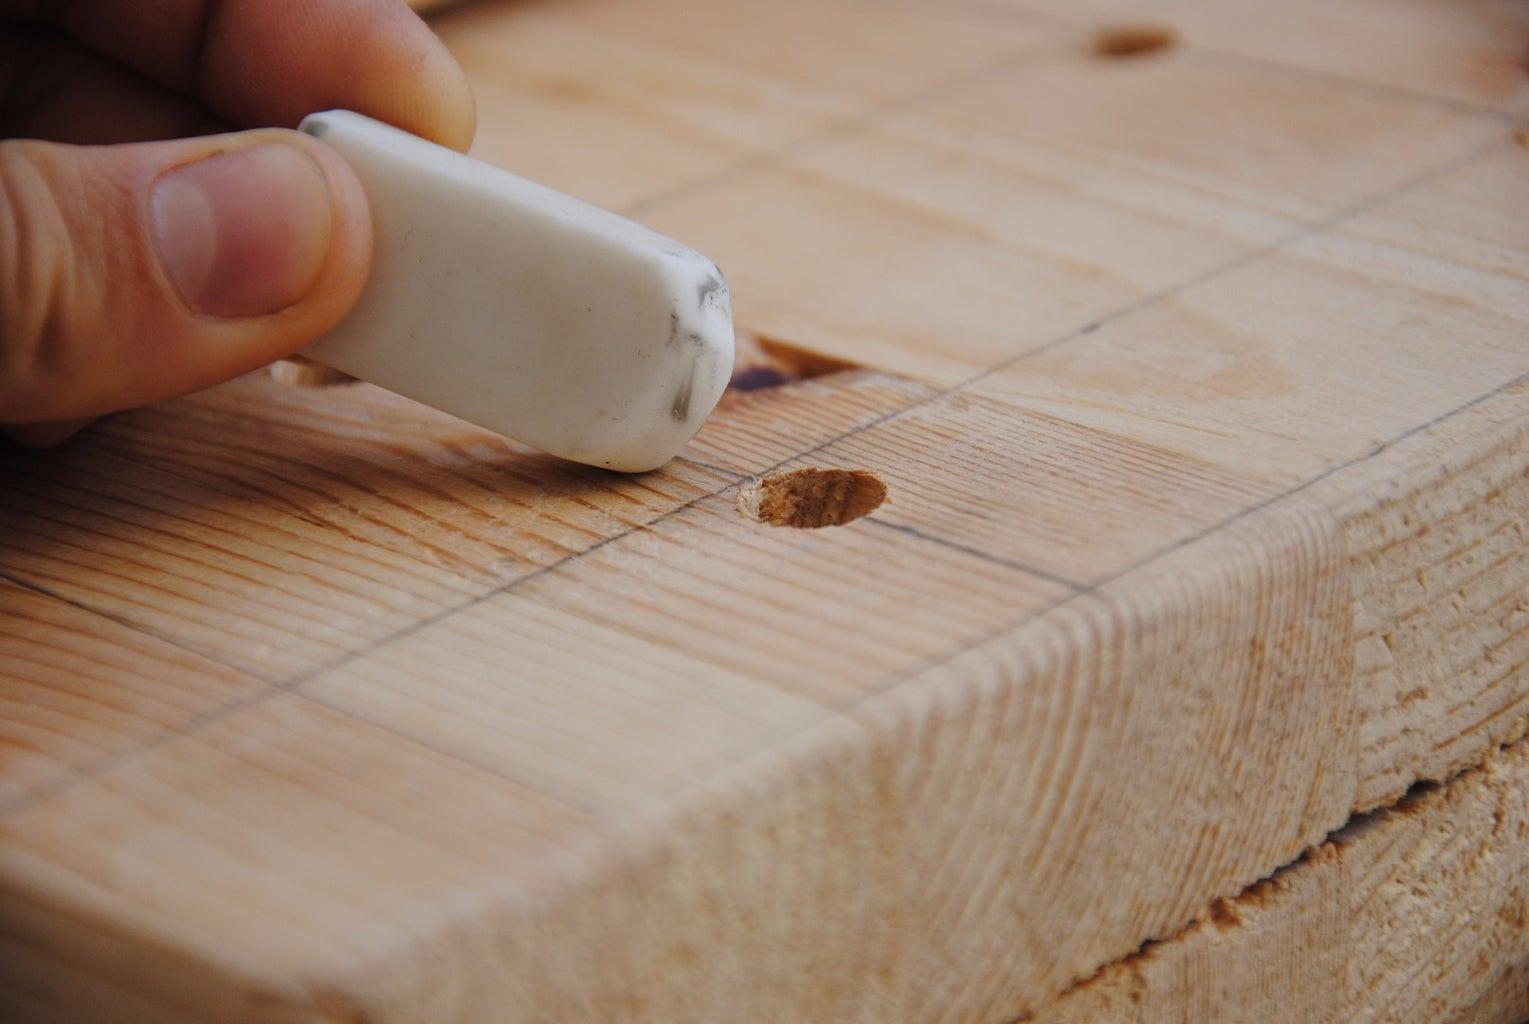 Erasing Pencil Marks, Sanding, & Applying Varnish